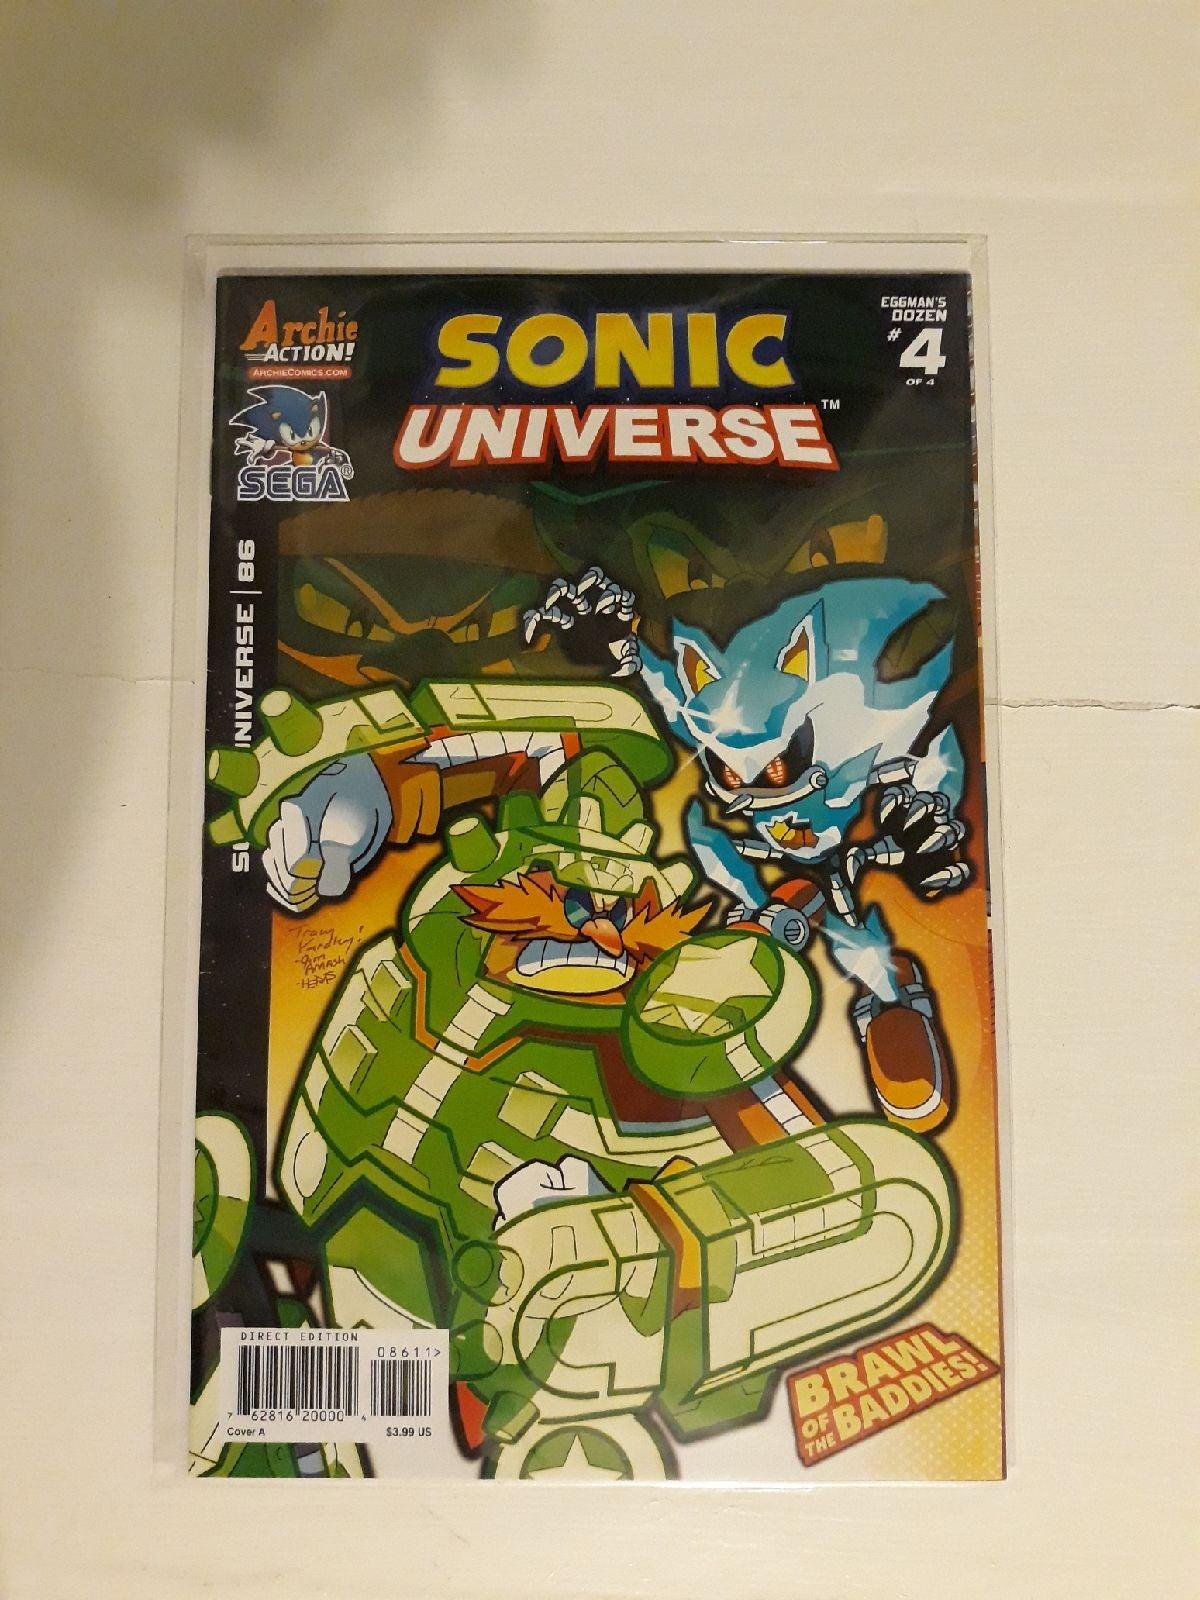 Sonic universe comic